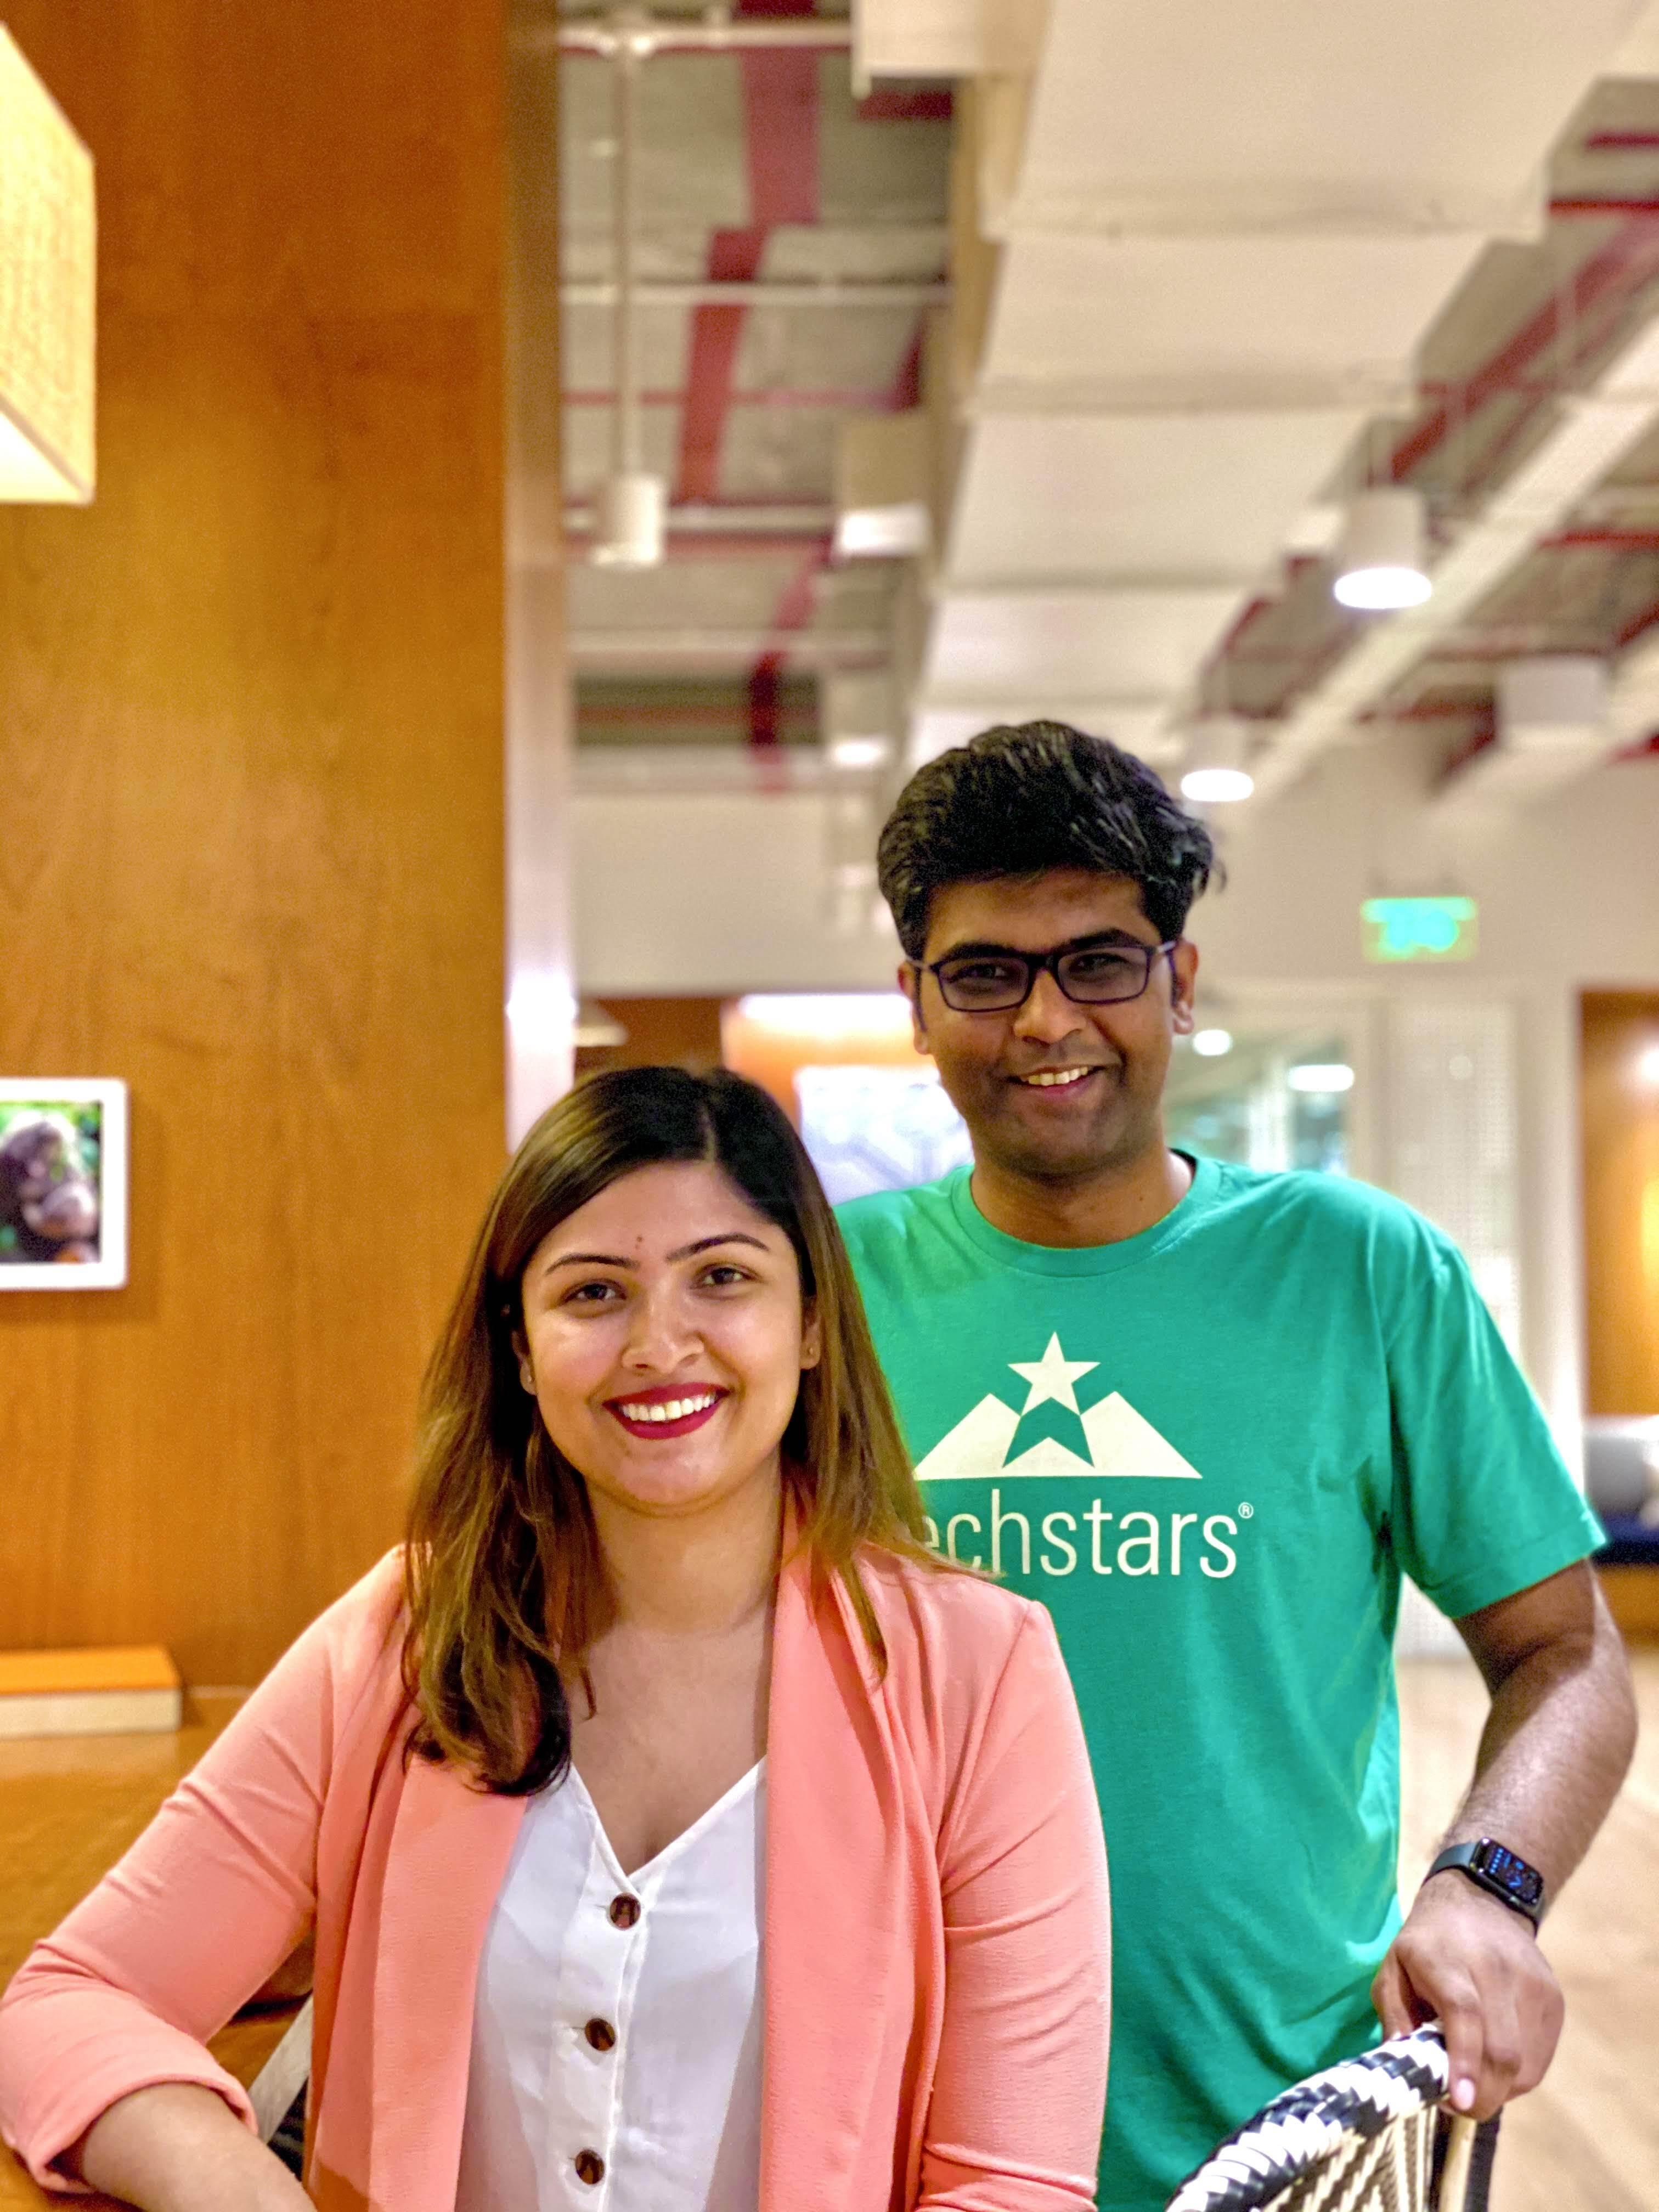 Seattle startup Symbl raises $4.7M from Amazon and others for 'conversational AI' enterprise tech - RapidAPI